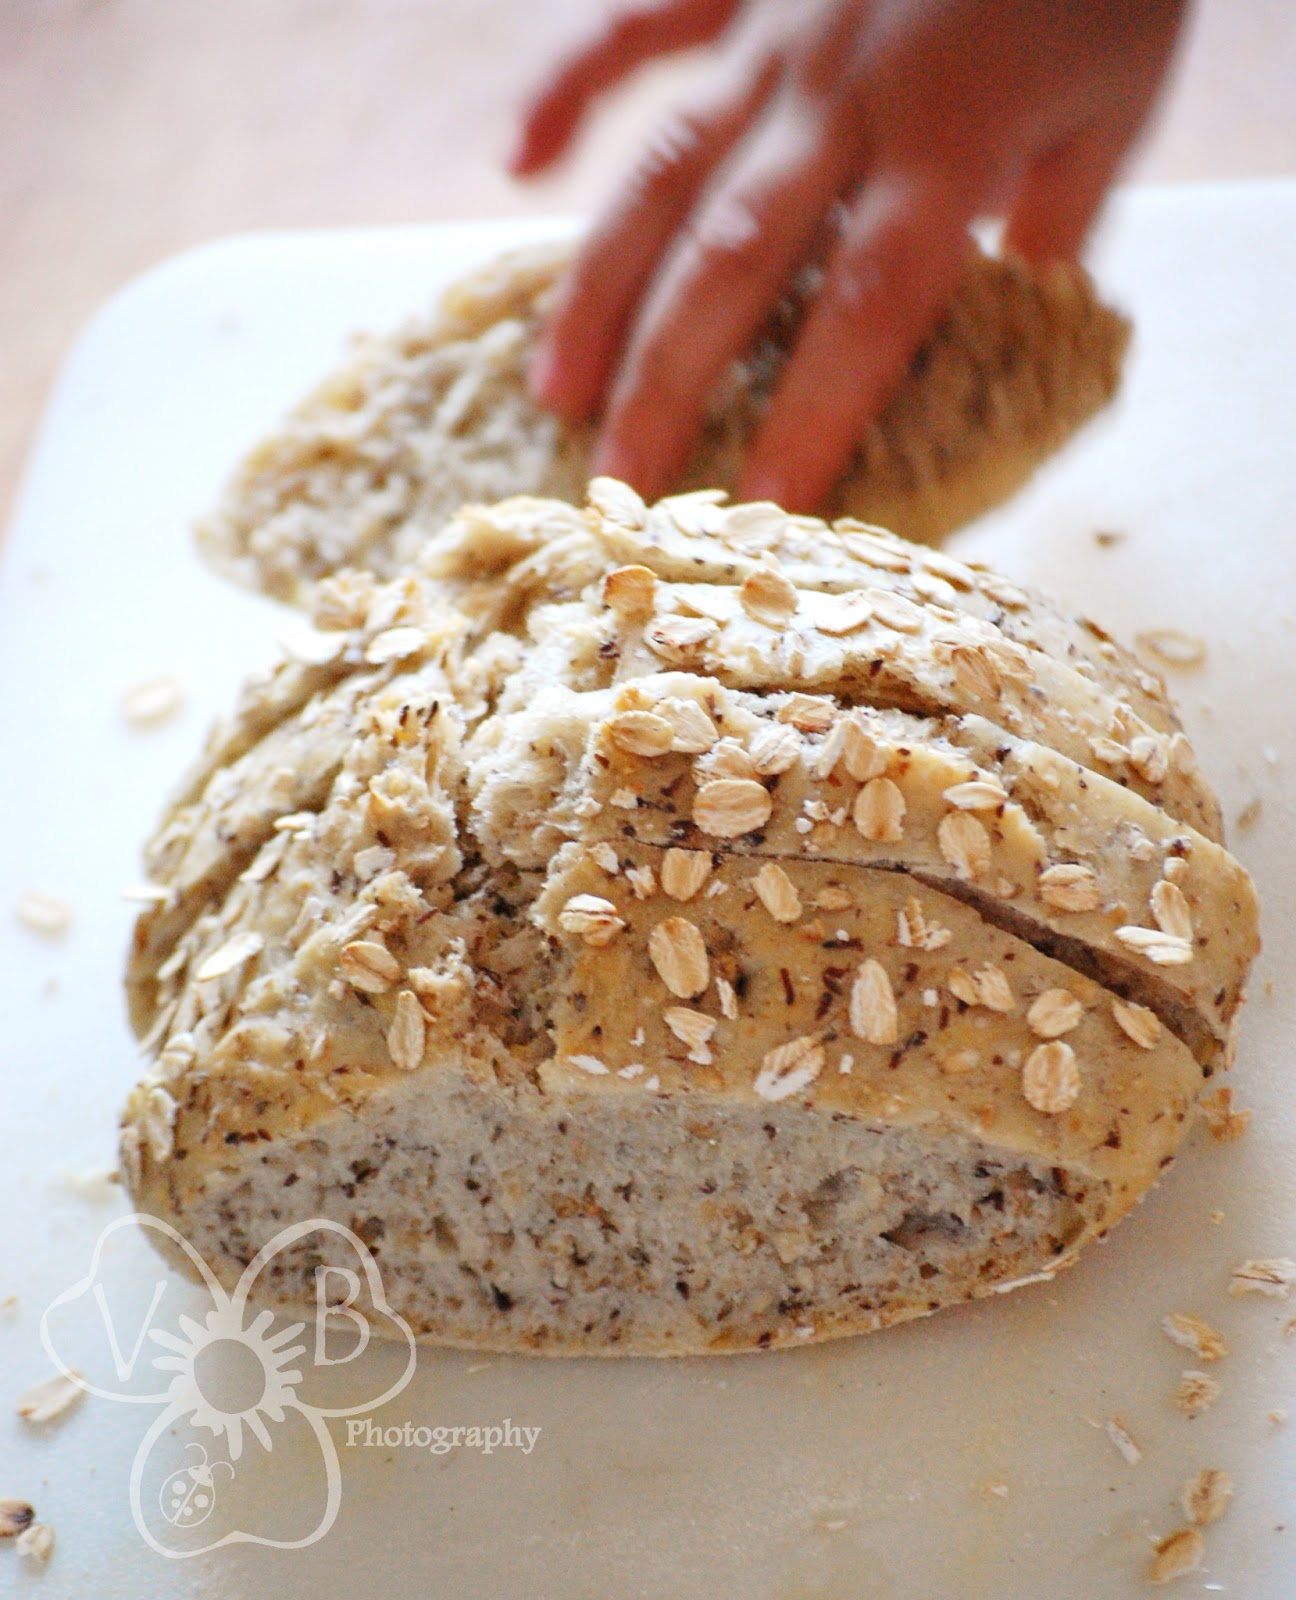 Violet's Buds: Artisan Free-Form No-Knead Bread